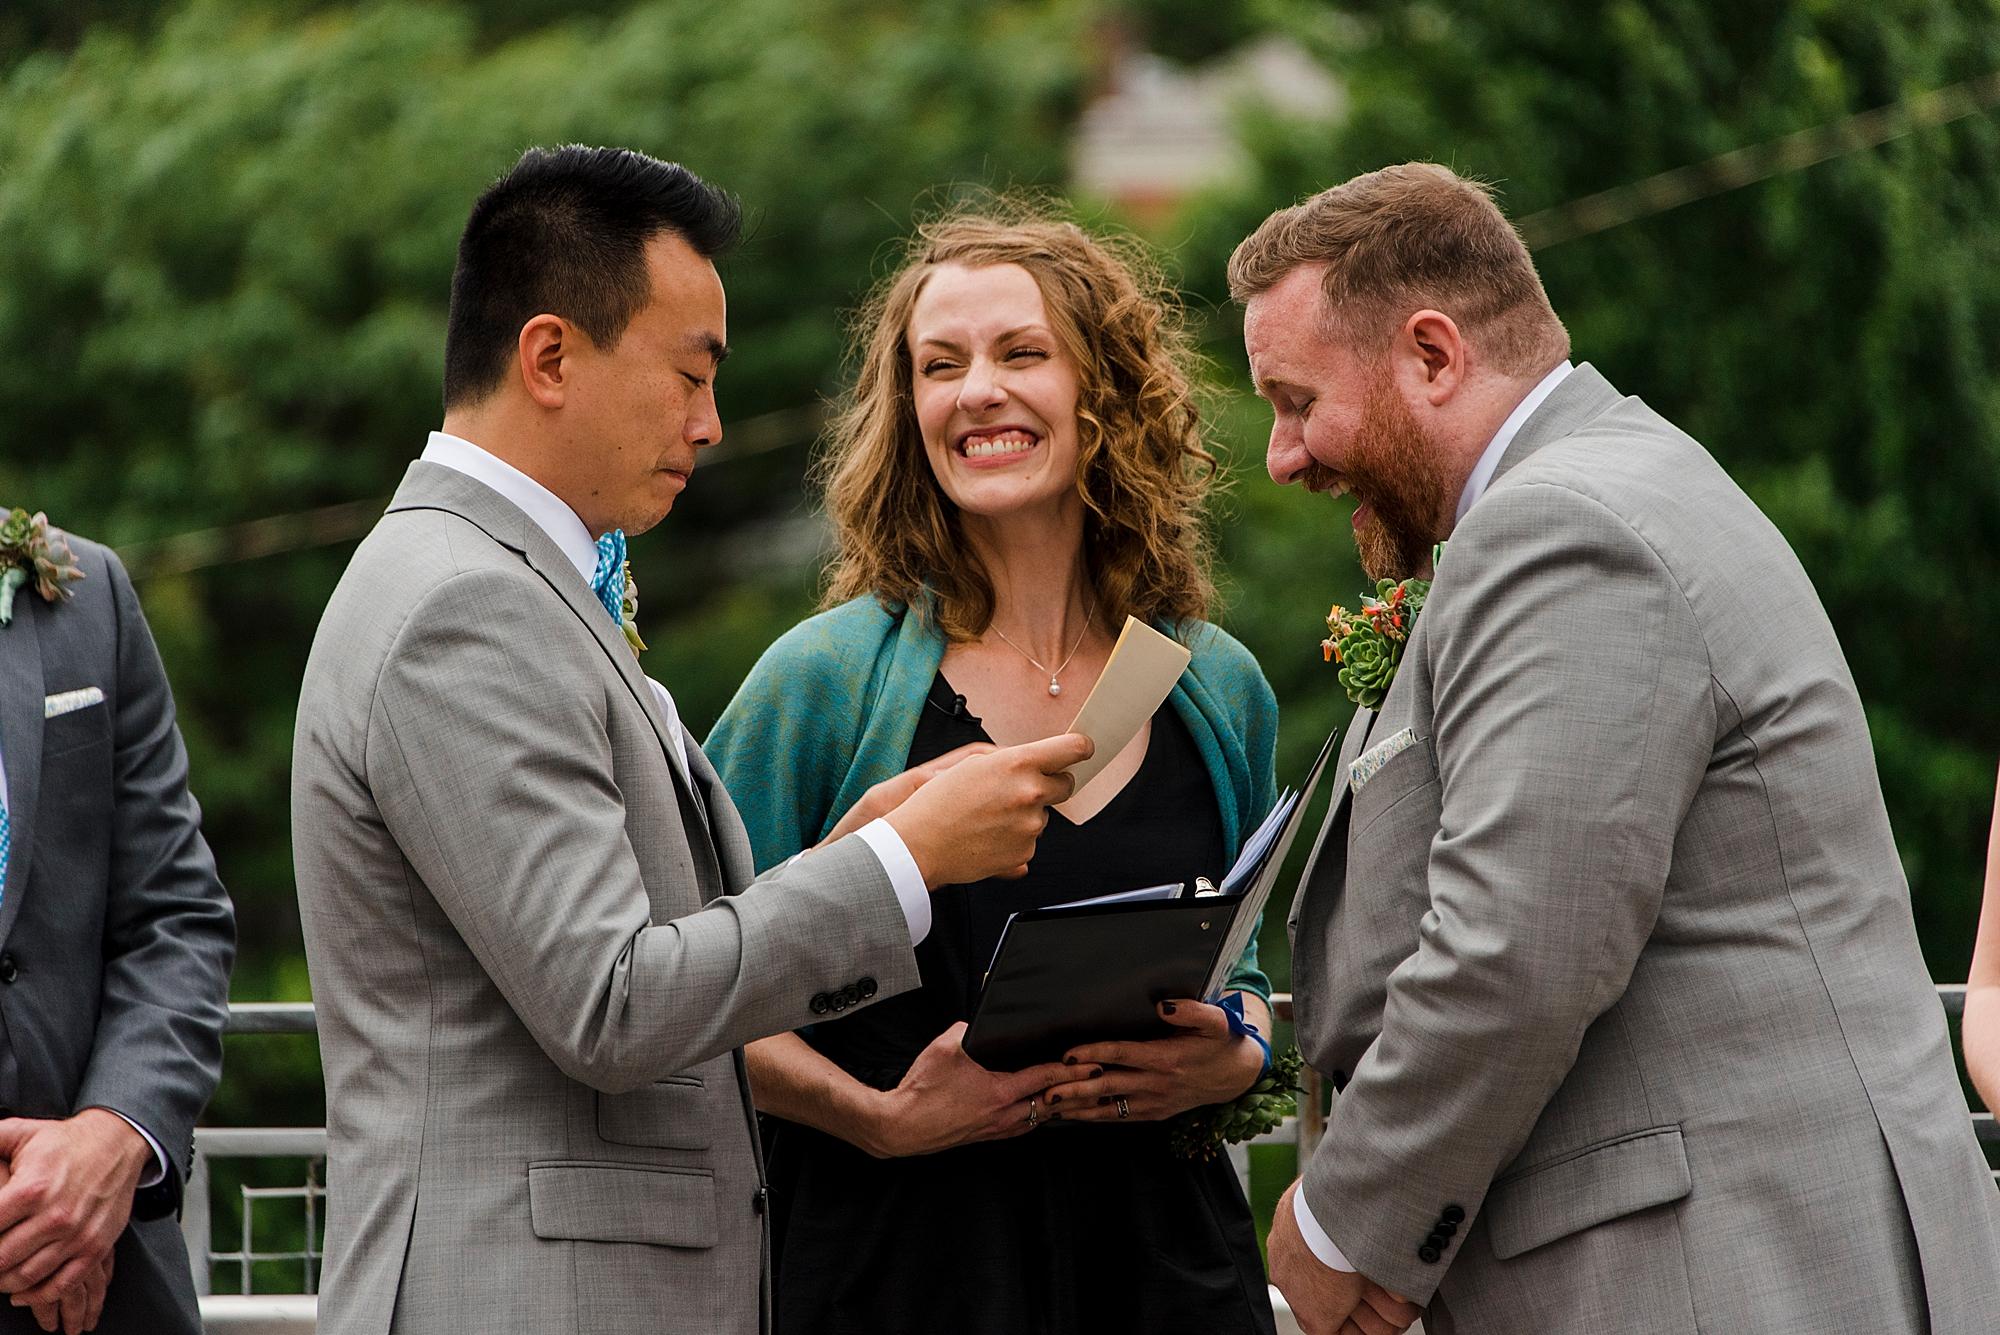 Dan_and_Byron_Love_by_Joe_Mac_Philadelphia_Wedding_LGBTQ_Photography_Gay_Independence_visitor_Center_97.JPG